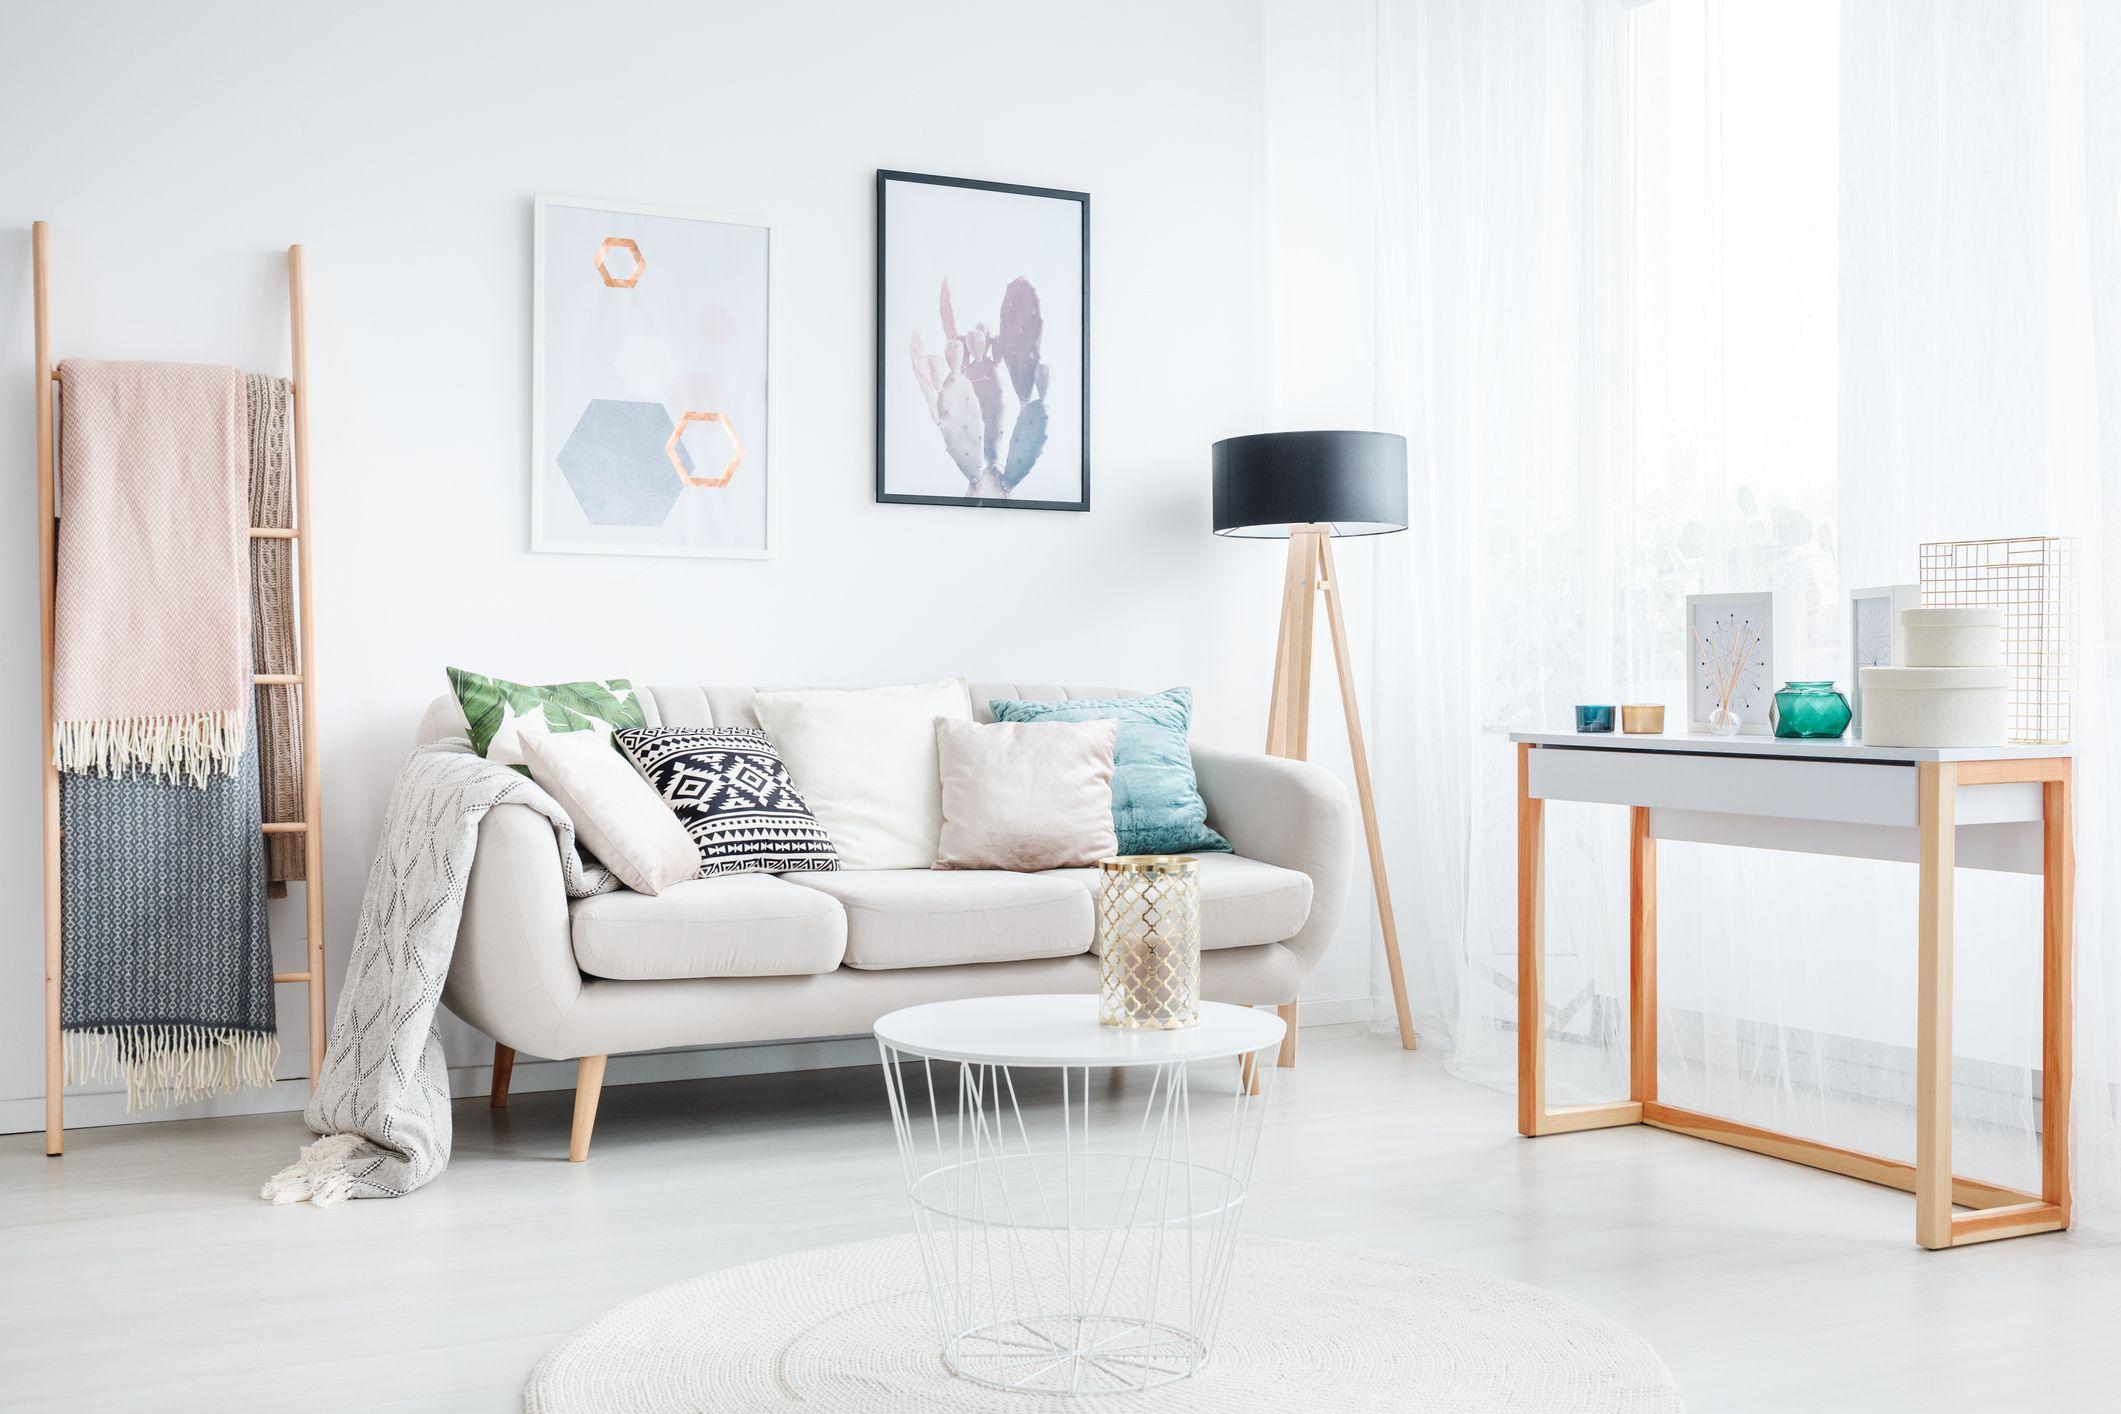 Interior Design Home Home Decorating & Interior Design Ideas